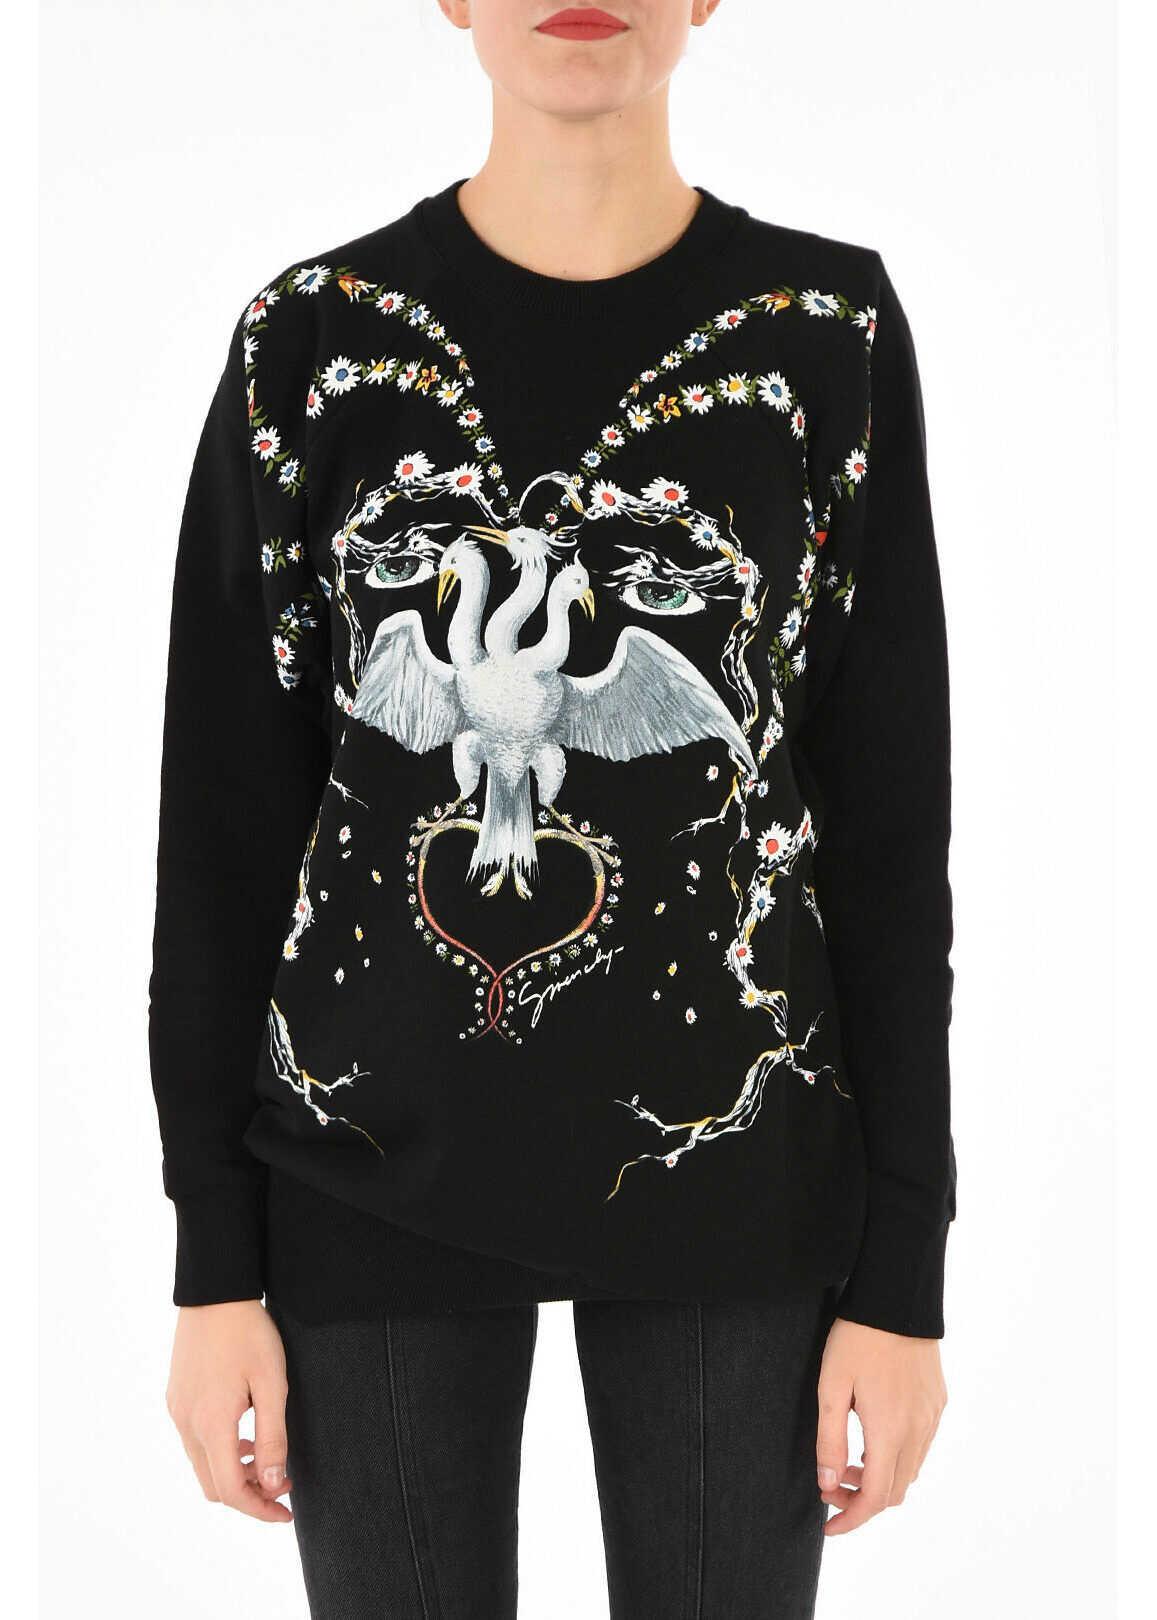 Givenchy Printed sweatshirt BLACK